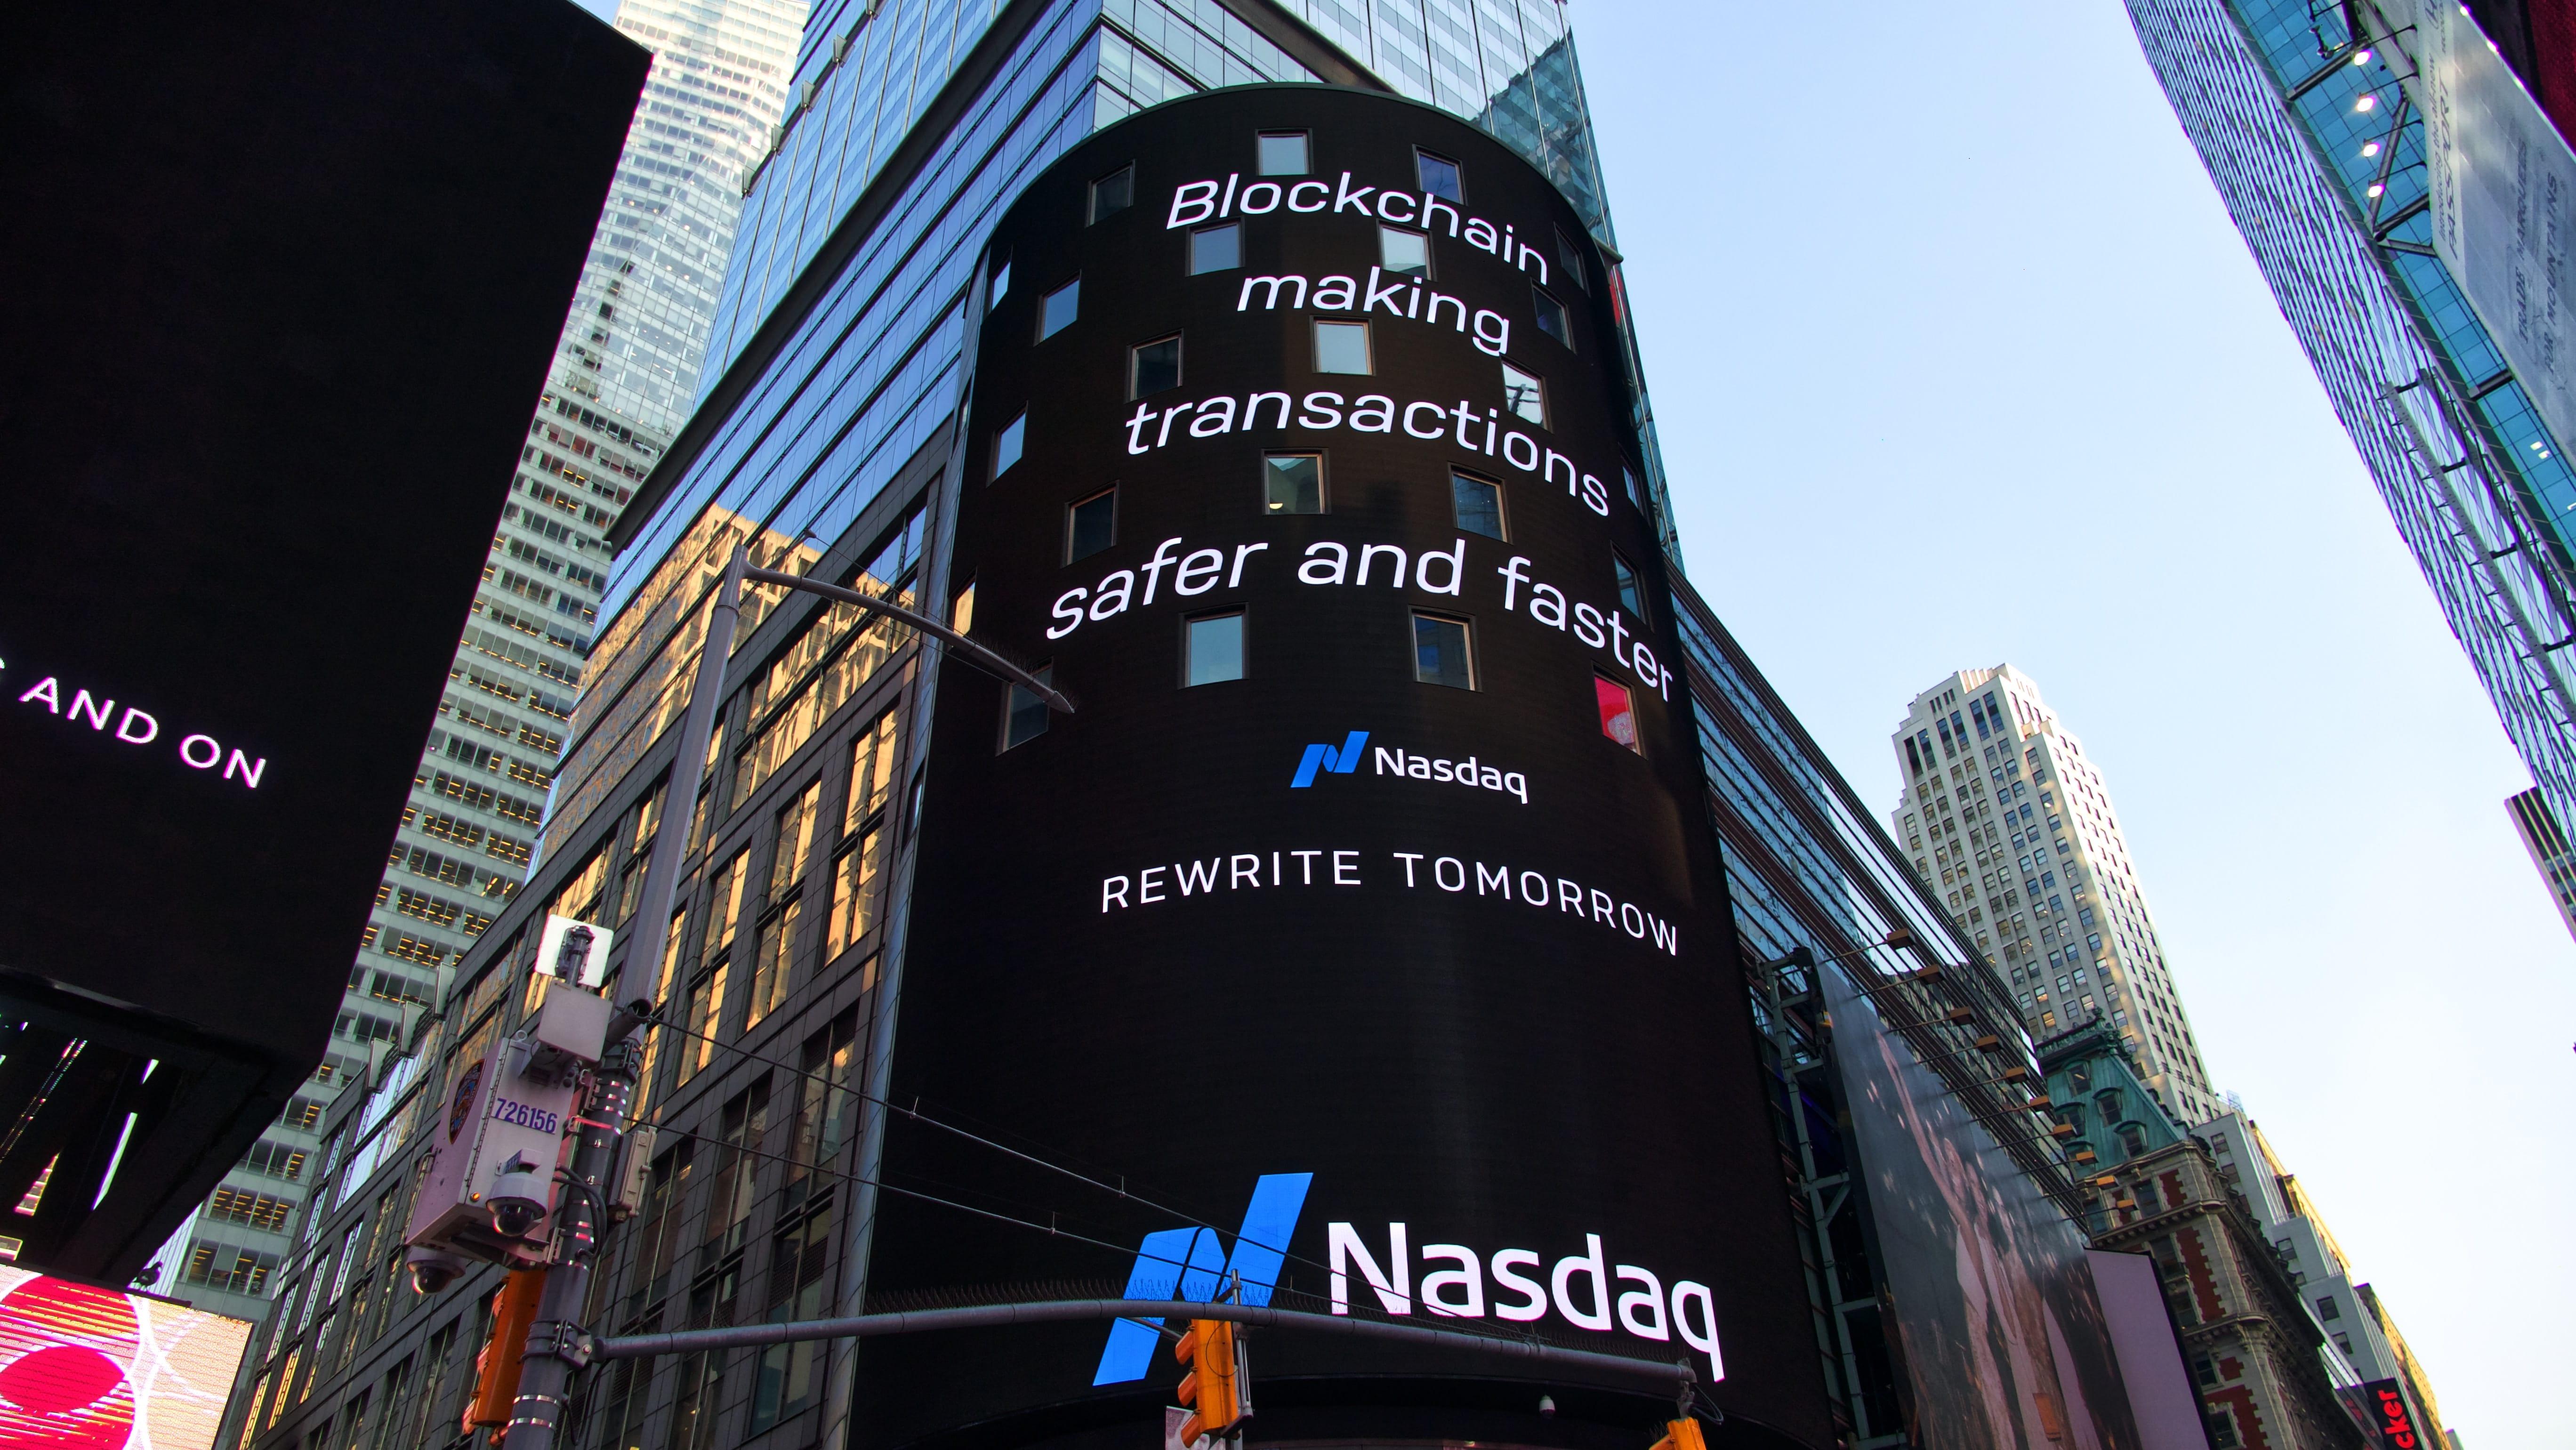 "Blockchain billboard in Times Square, New York City, saying ""Blockchain making transactions safer and faster. Nasdaq."" Image by Pascal Bernardon, via Unsplash.com."